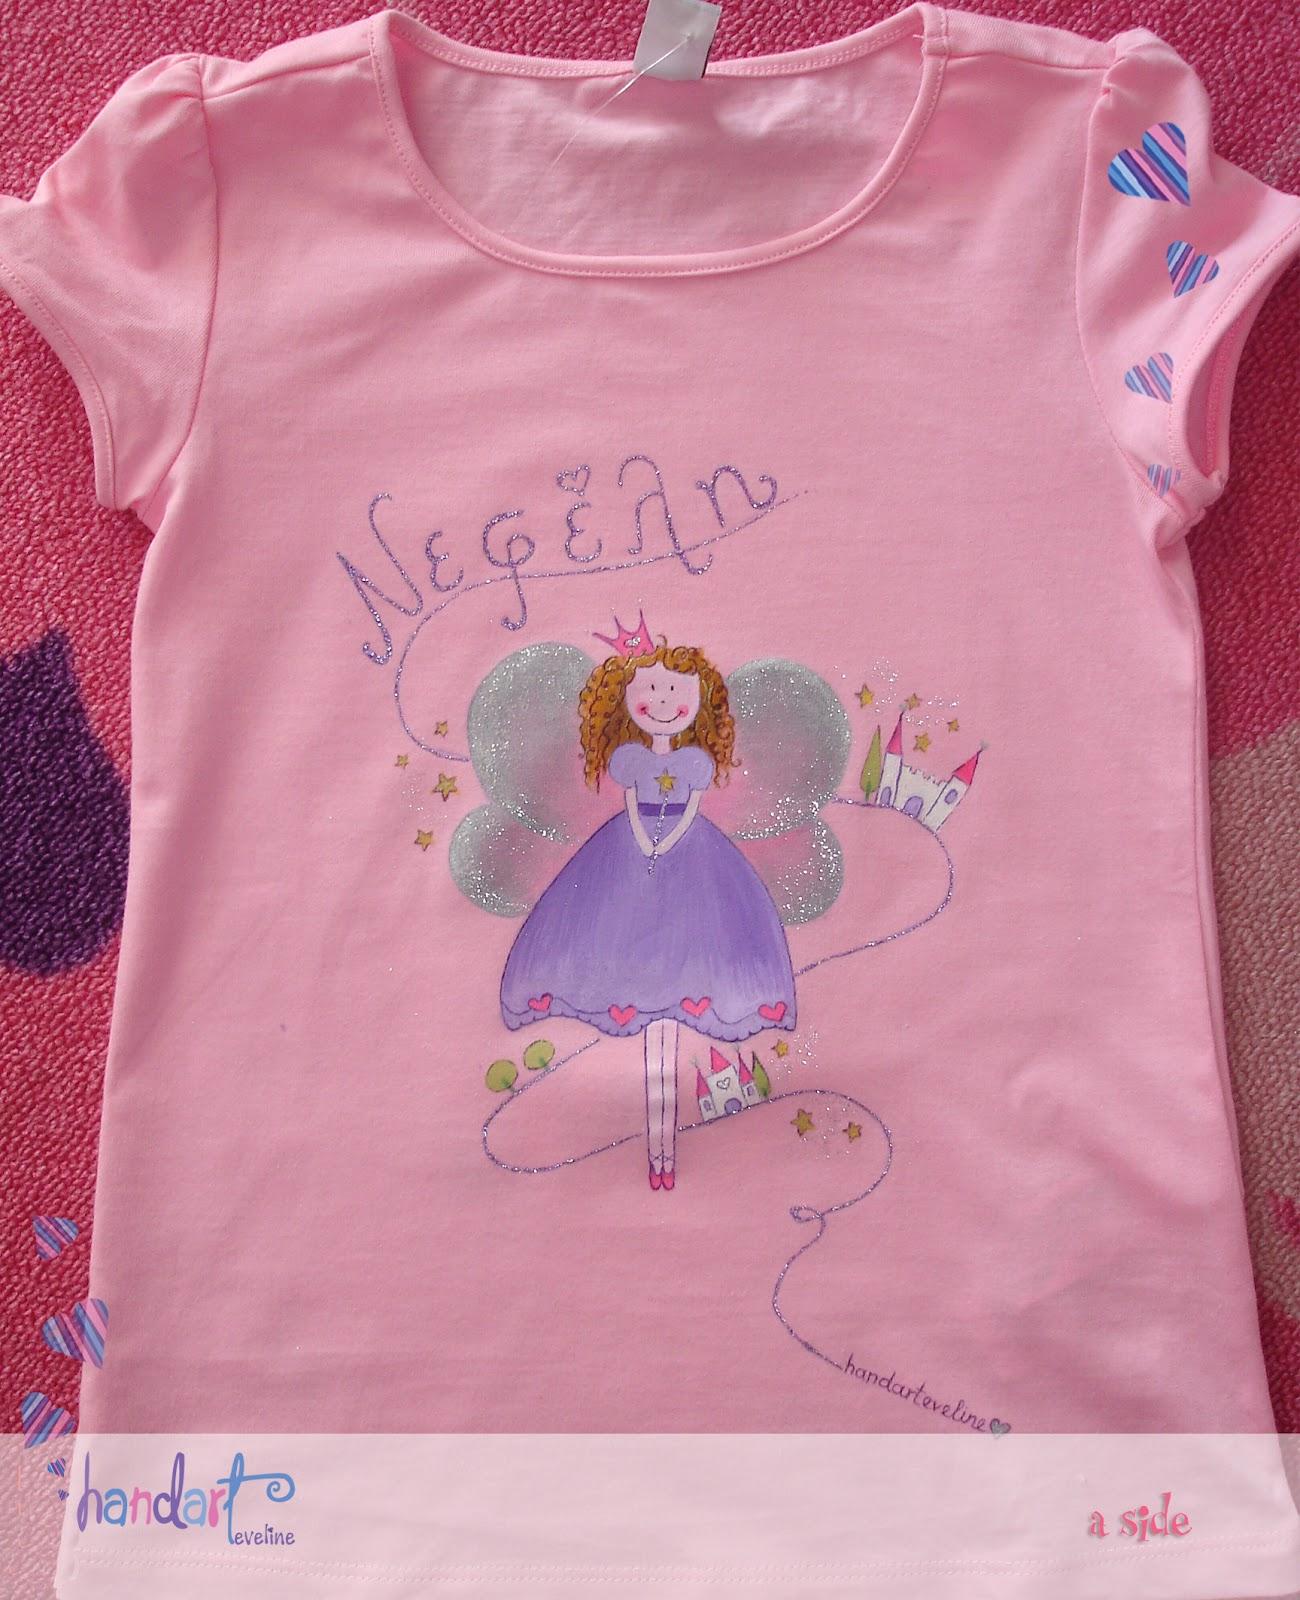 8f5c6a9681b7 Μπροστινή πλευρά από βαμβακερό μπλουζάκι ζωγραφισμένο στο χέρι με ειδικά  χρώματα για ύφασμα σε ροζ χρώμα. Επιτέλους και ένα μπλουζάκι για τη δική  μου ...